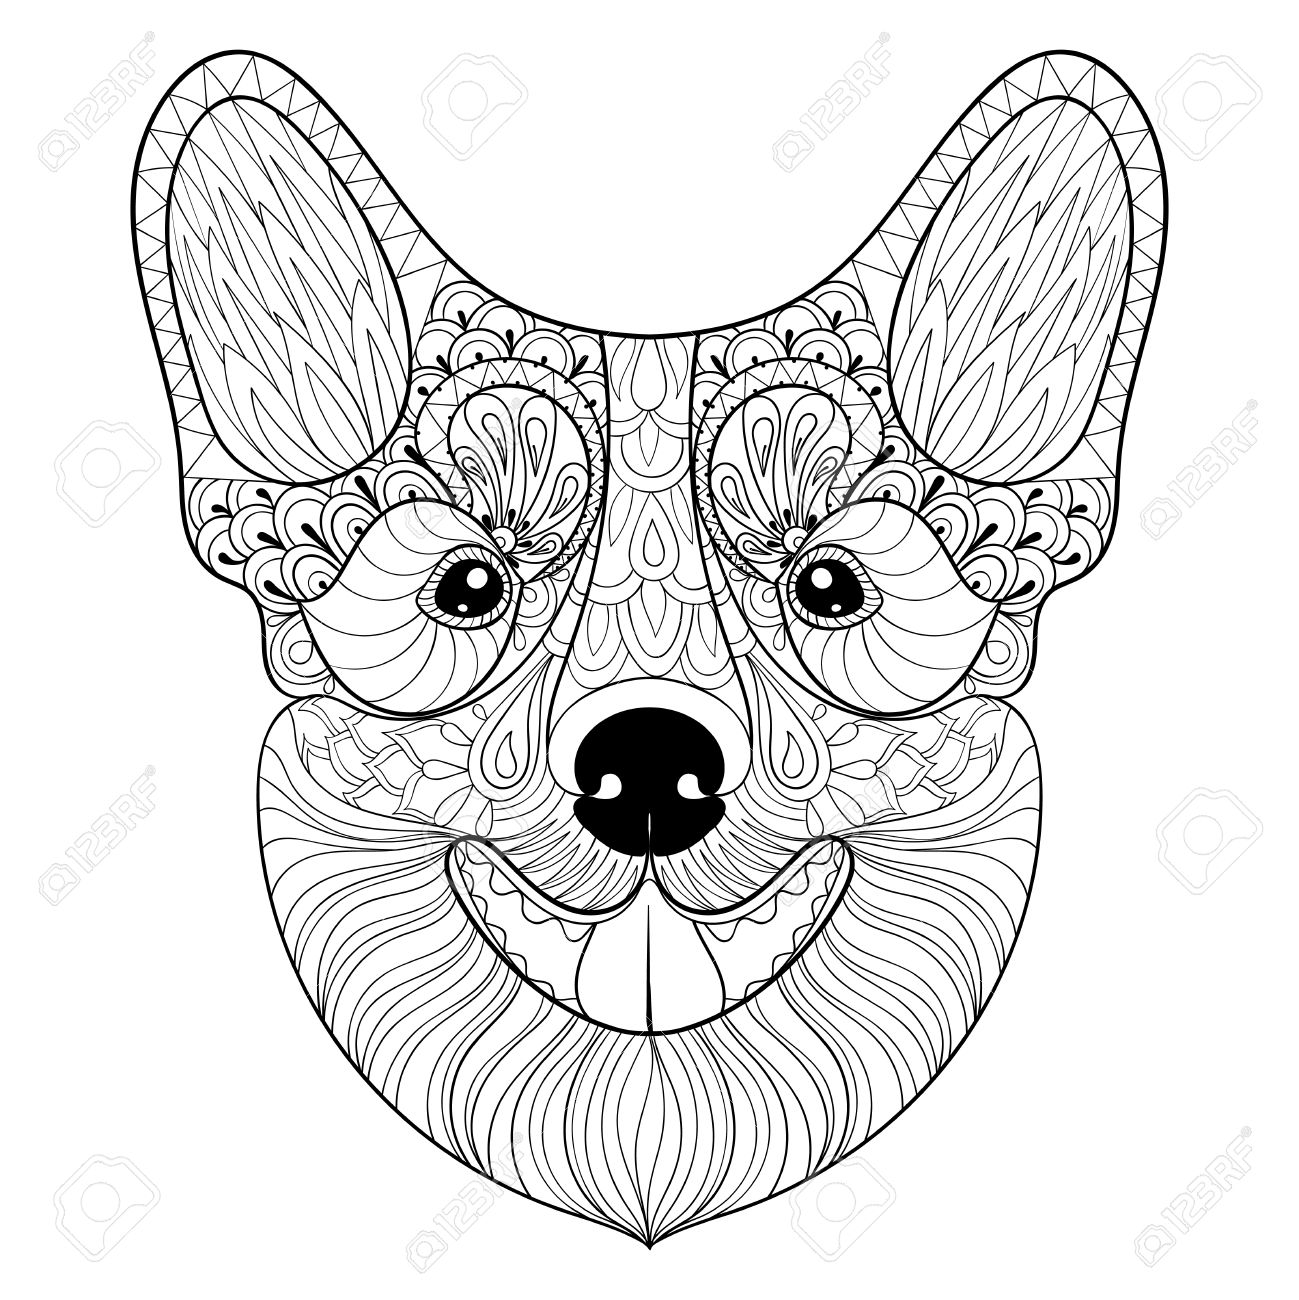 1299x1300 Dog Face In Monochrome Doodle Style. Puppy, Pembroke Welsh Corgi